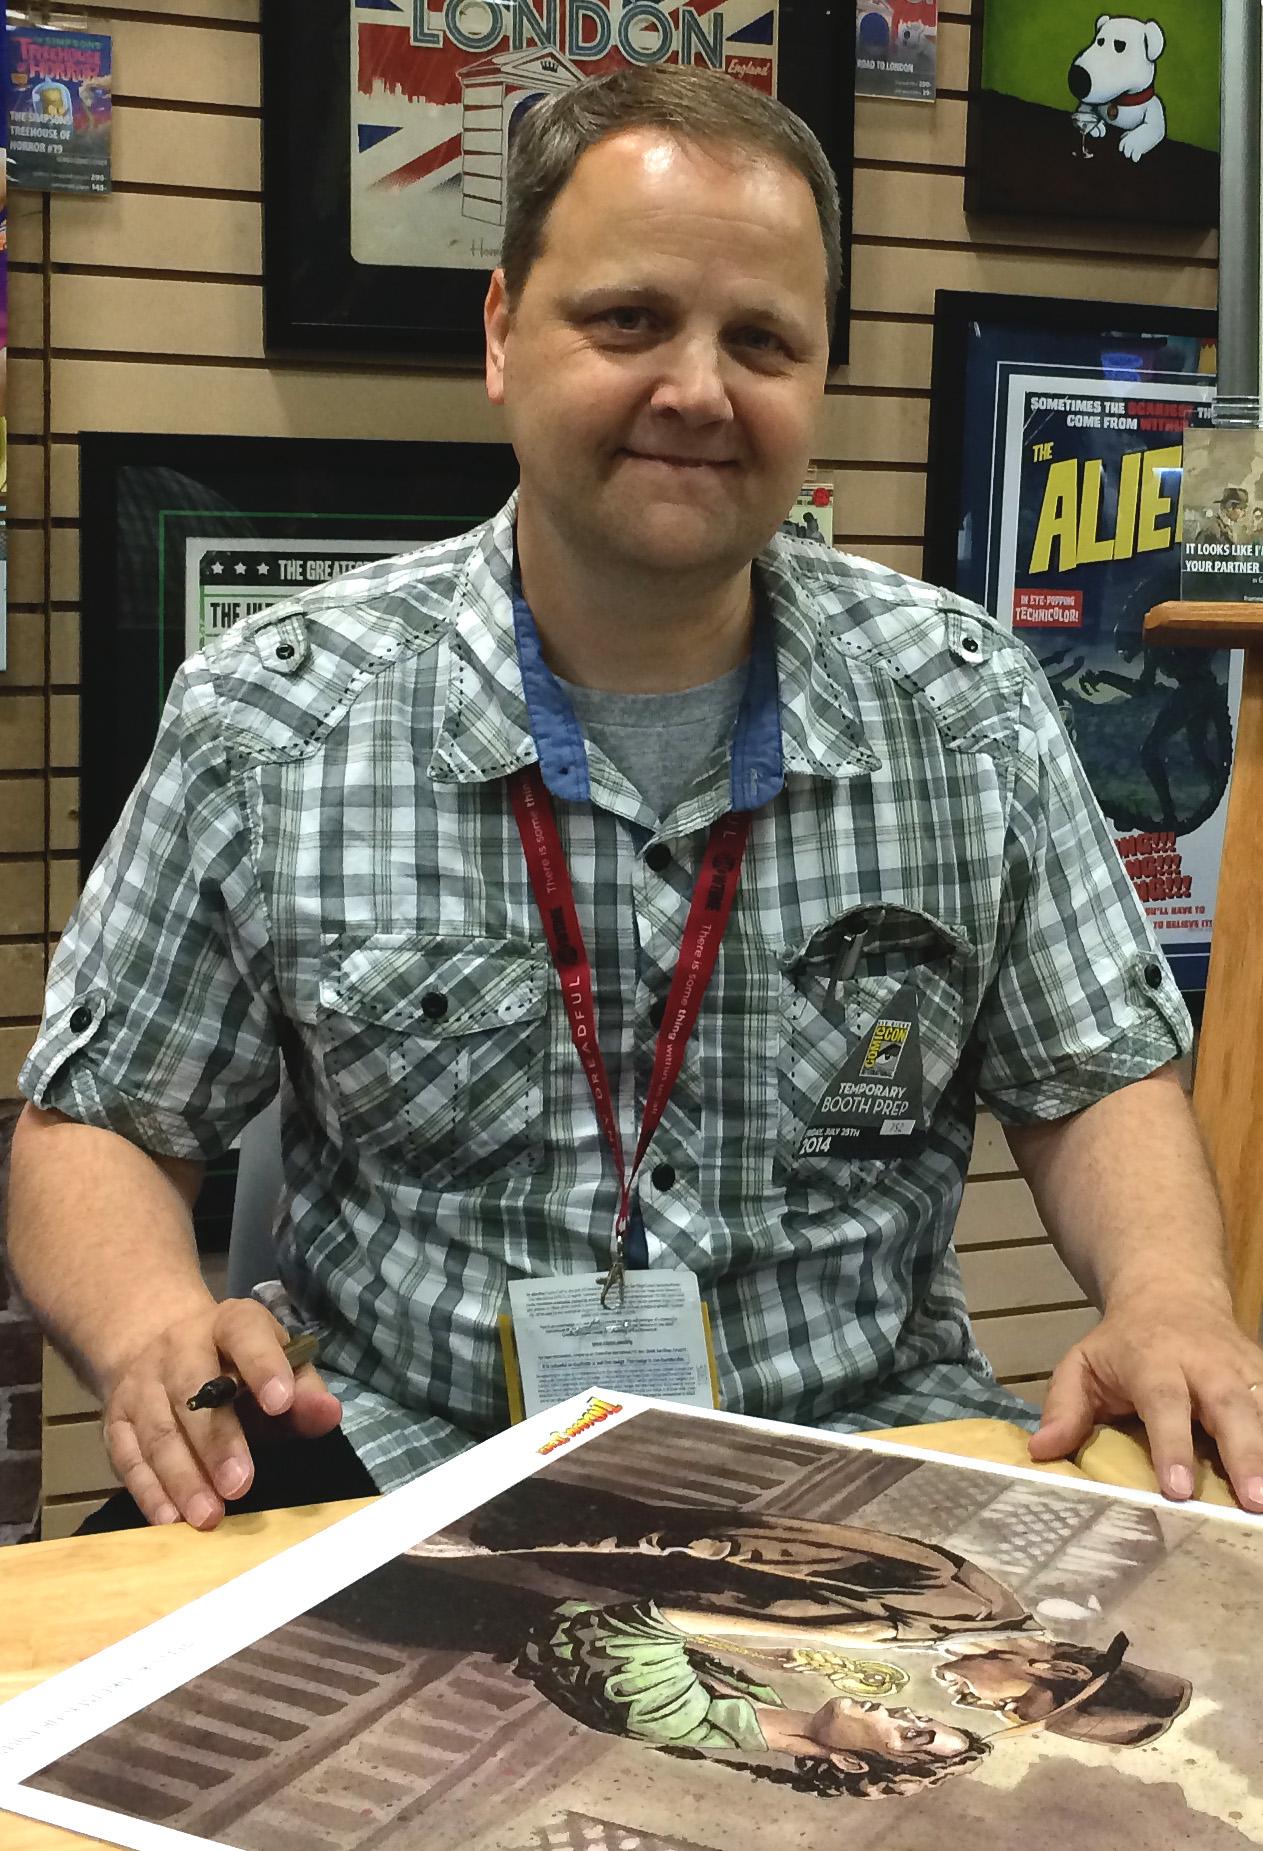 Gary Shipman signs his [[Indiana Jones (franchise)|Indiana Jones]] artwork at [[San Diego Comic-Con]] in 2014.